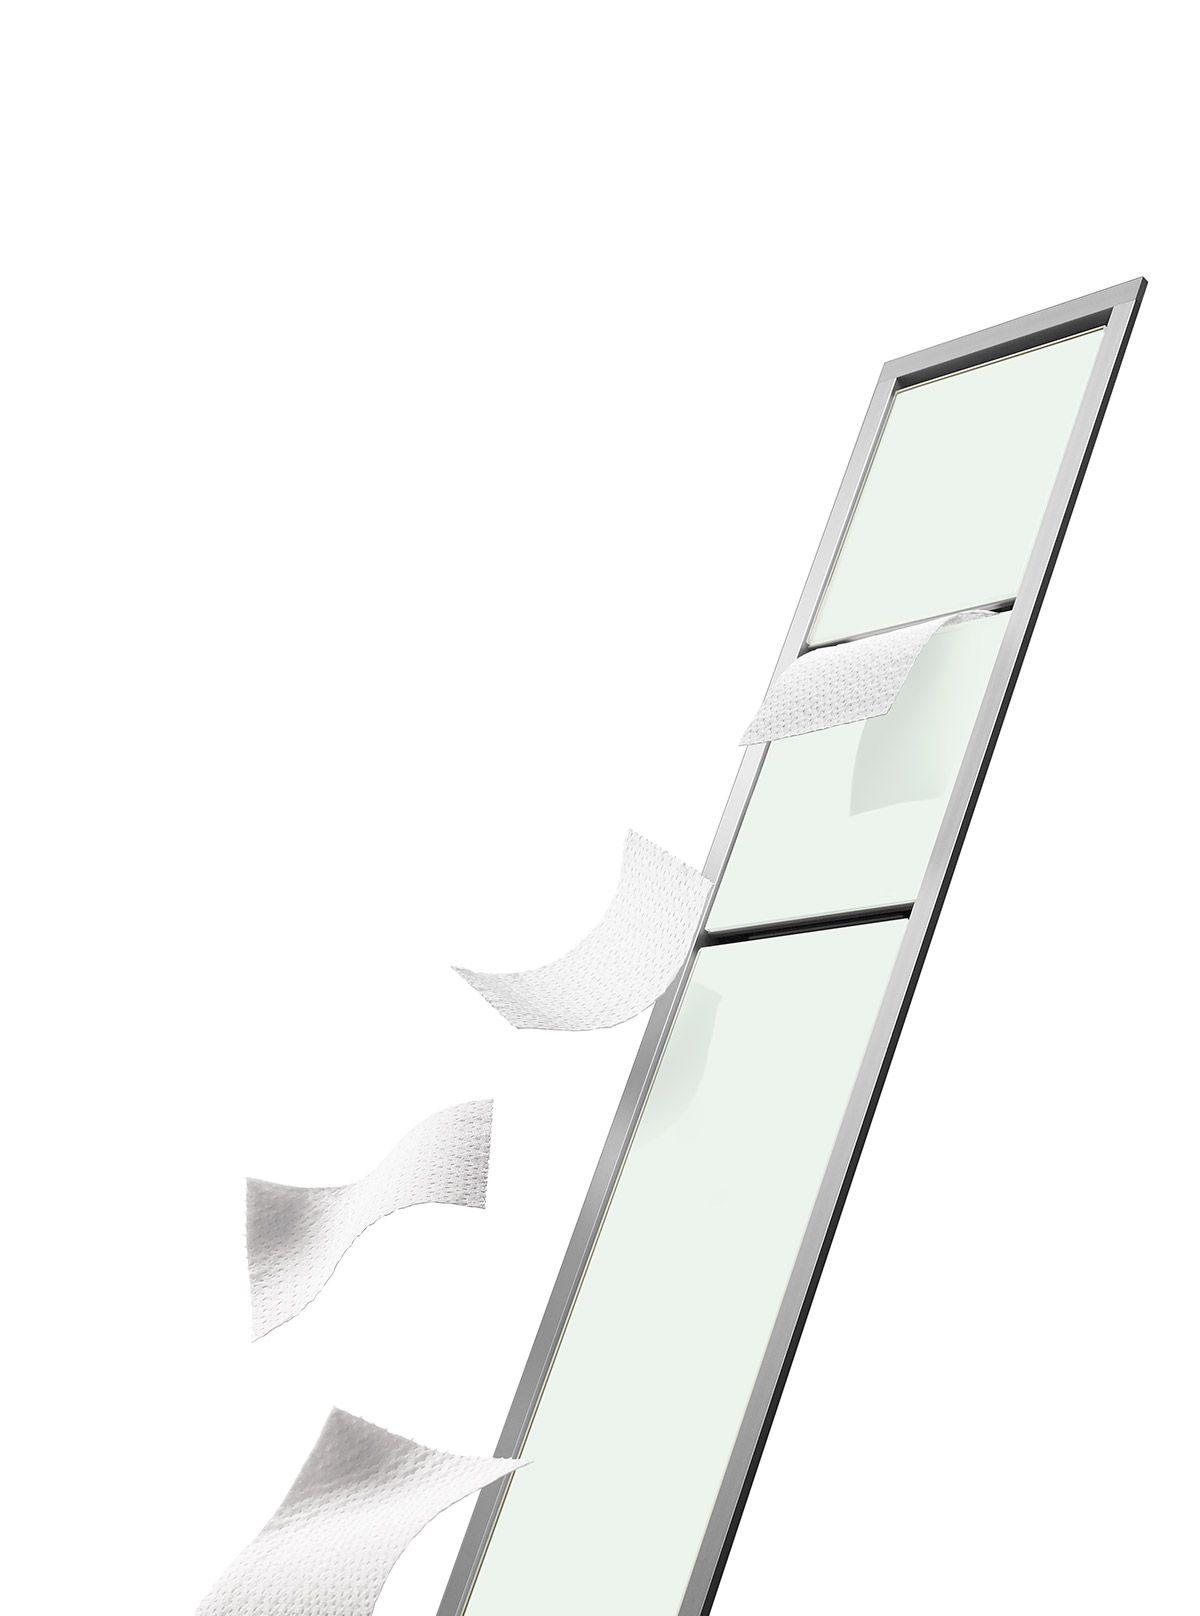 emco asis built in wc paper brush holder unterputz wc. Black Bedroom Furniture Sets. Home Design Ideas